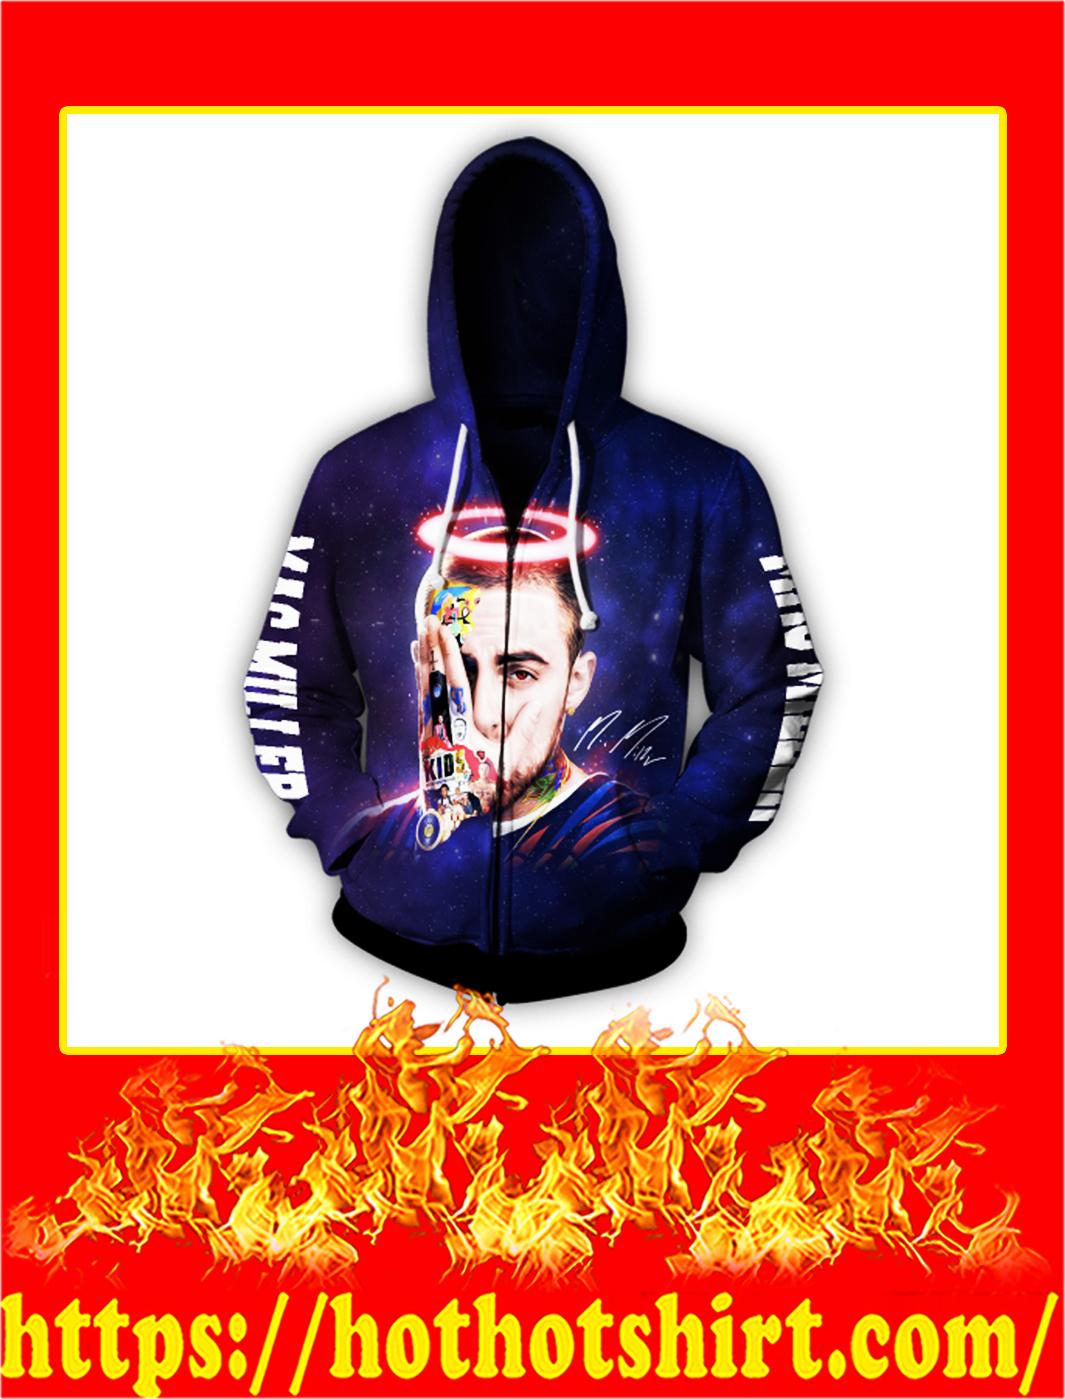 Mac Miller Full Over Print zip hoodieMac Miller Full Over Print zip hoodie